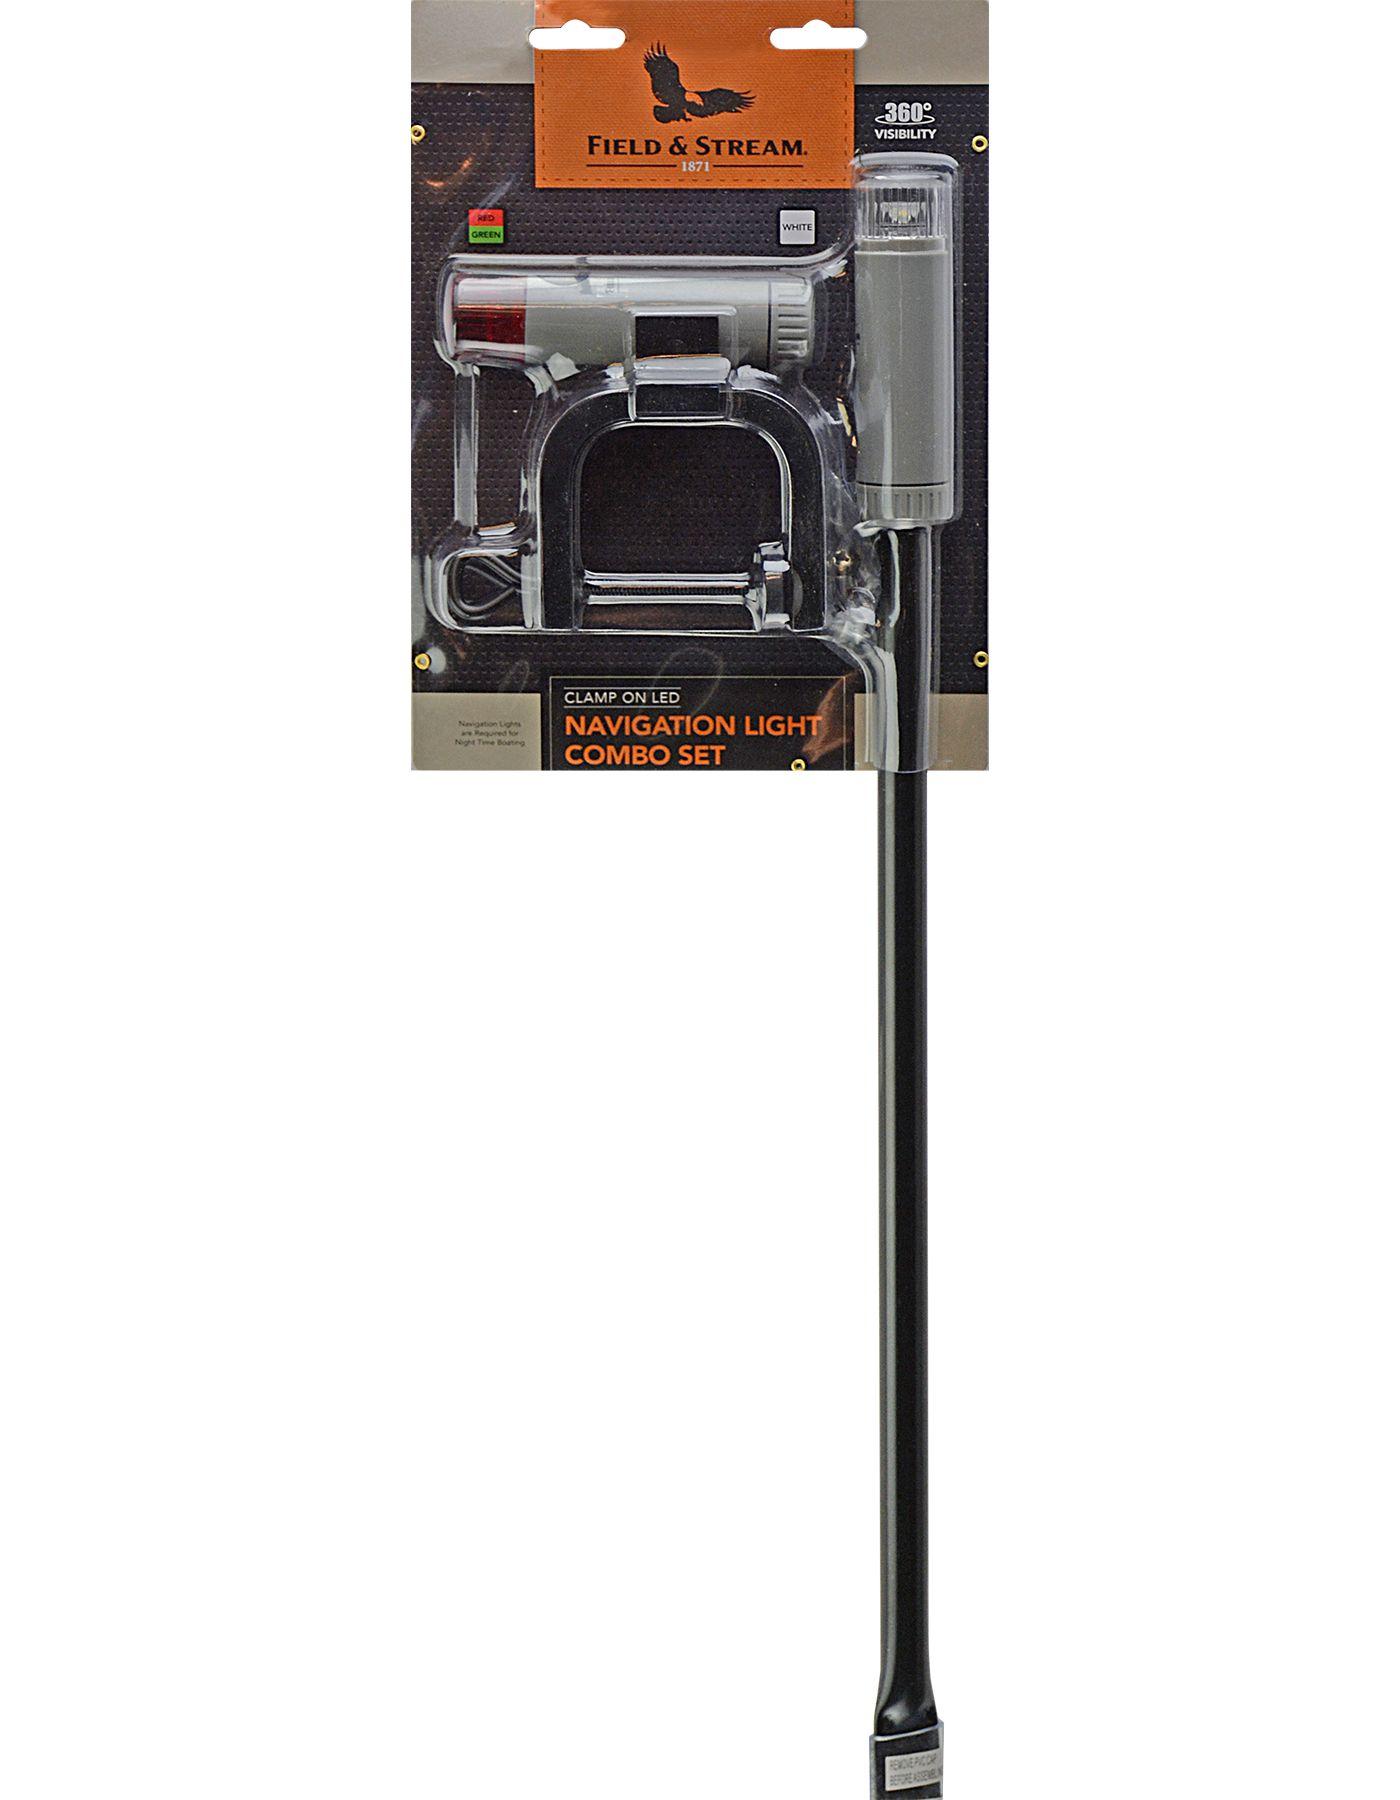 Field & Stream Navigation Light Combo Set